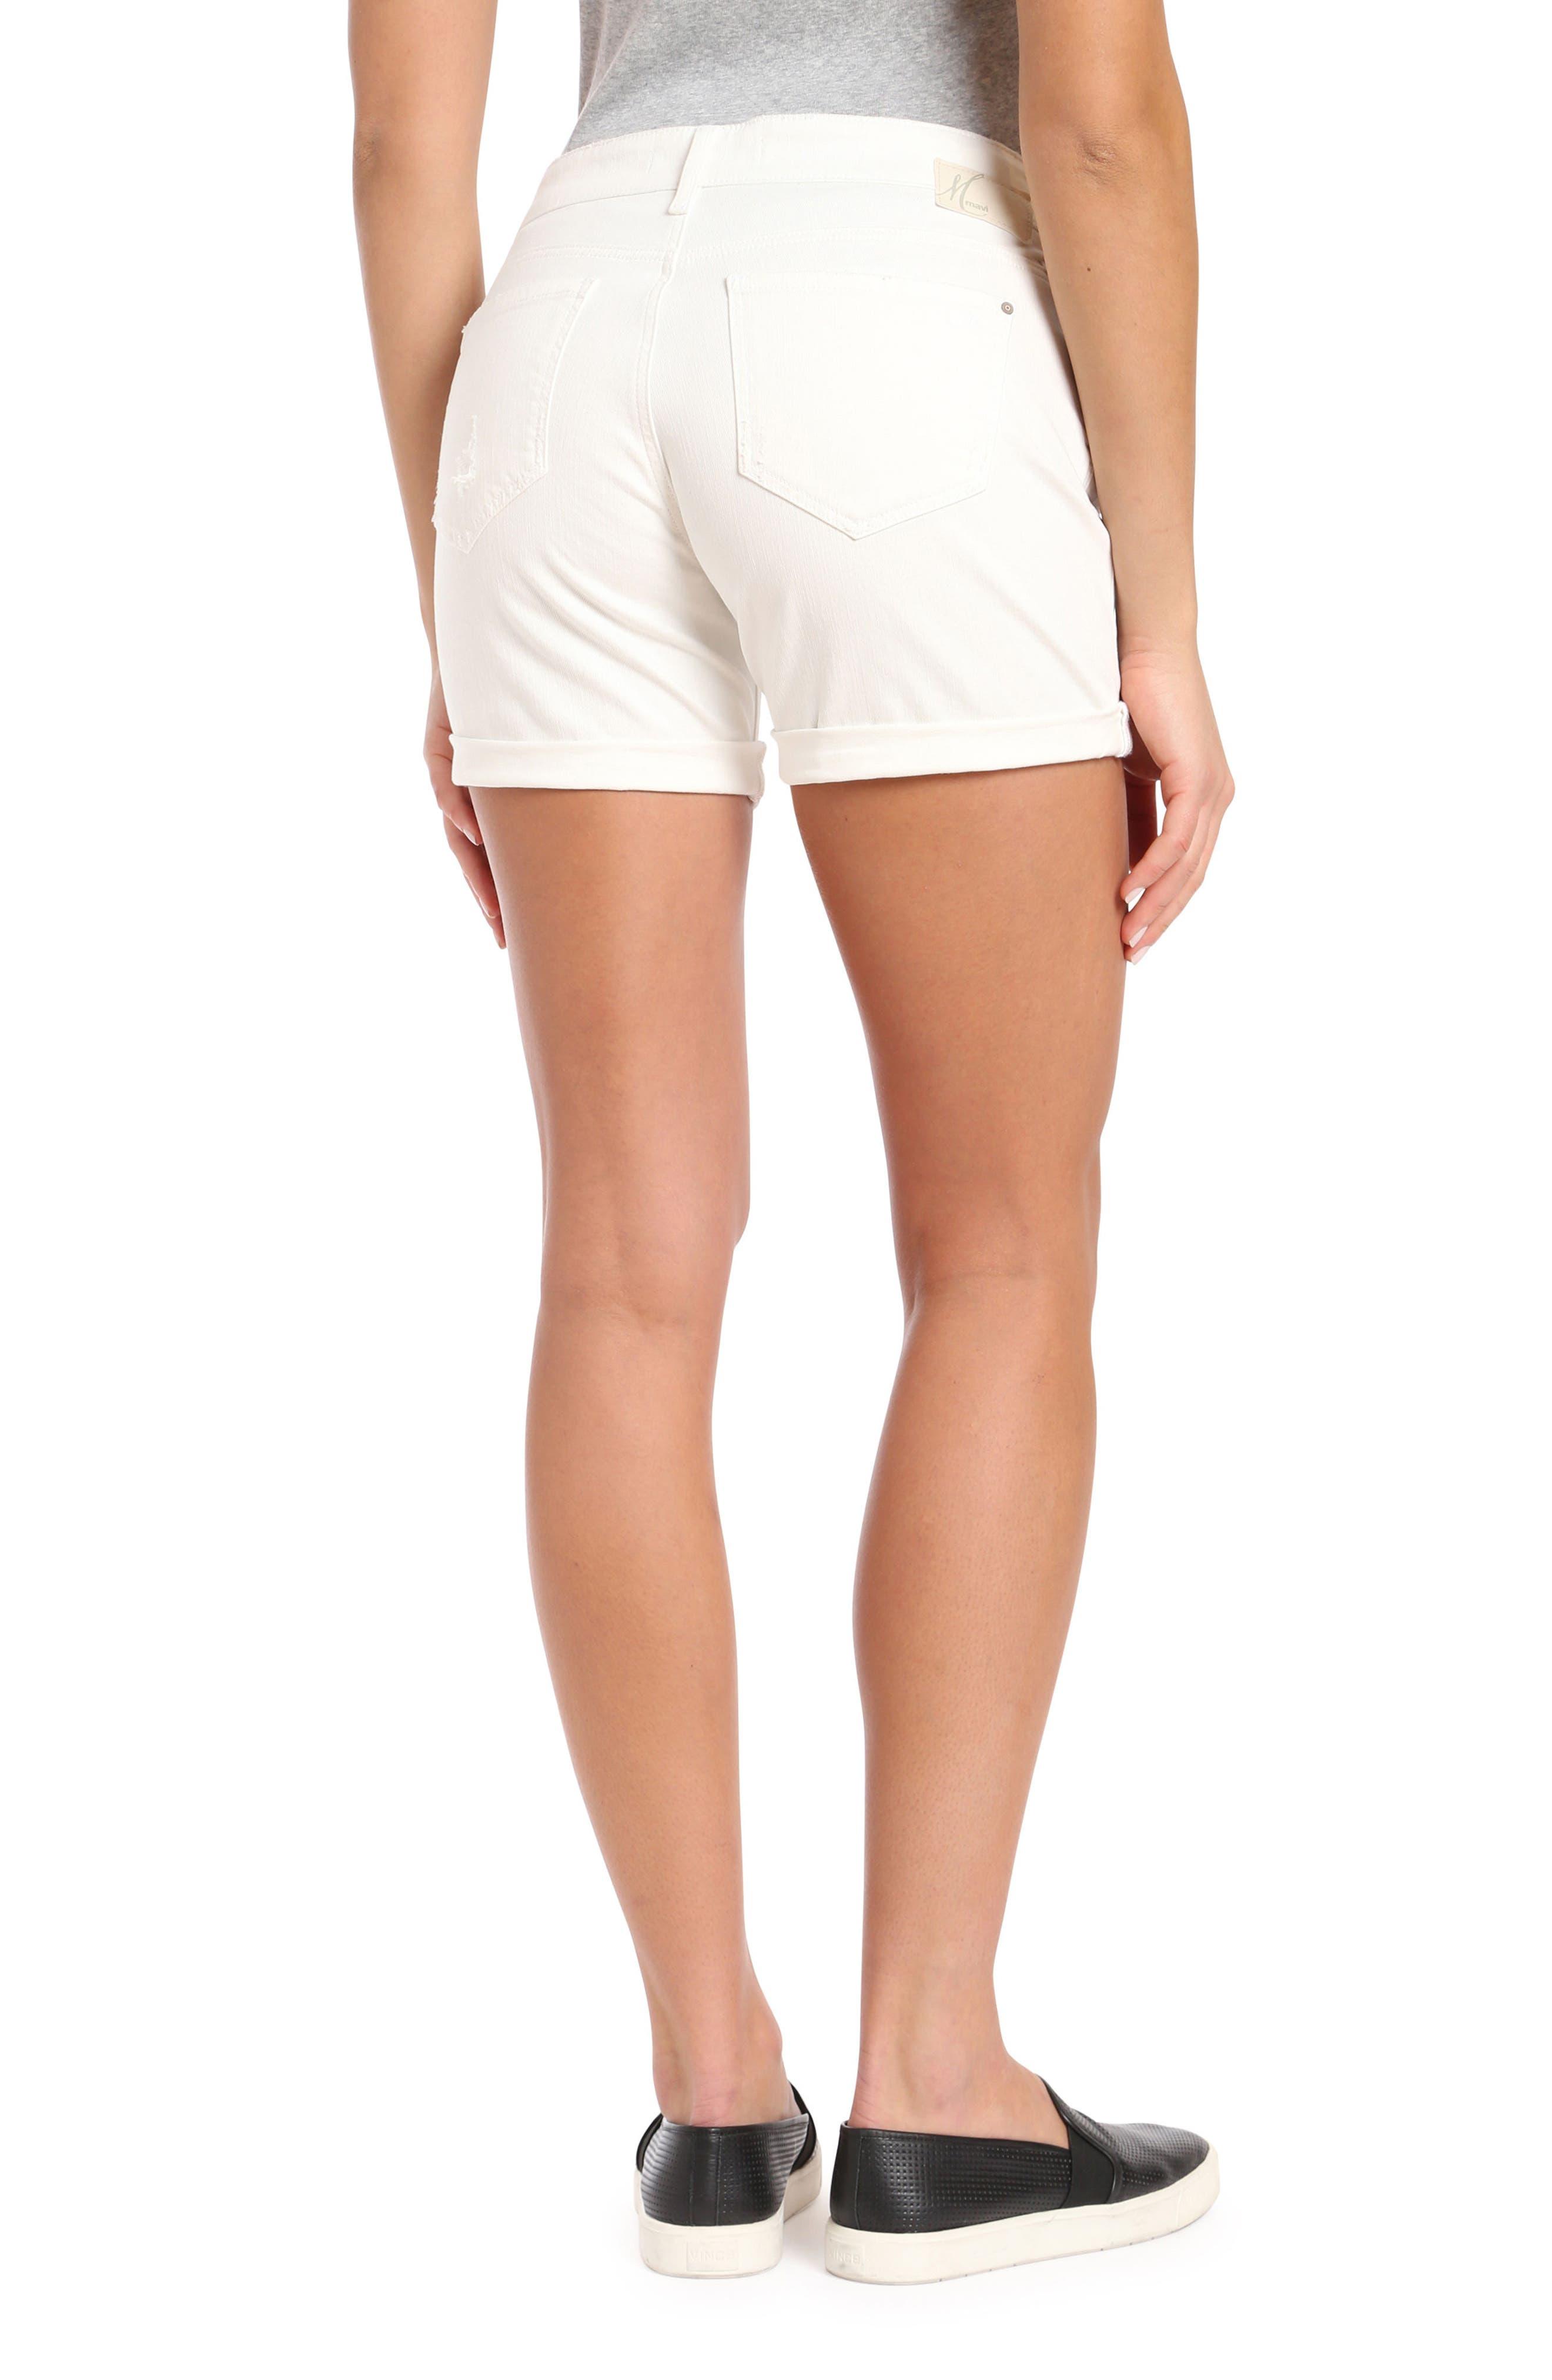 Pixie Ripped Denim Shorts,                             Alternate thumbnail 2, color,                             White Ripped Nolita